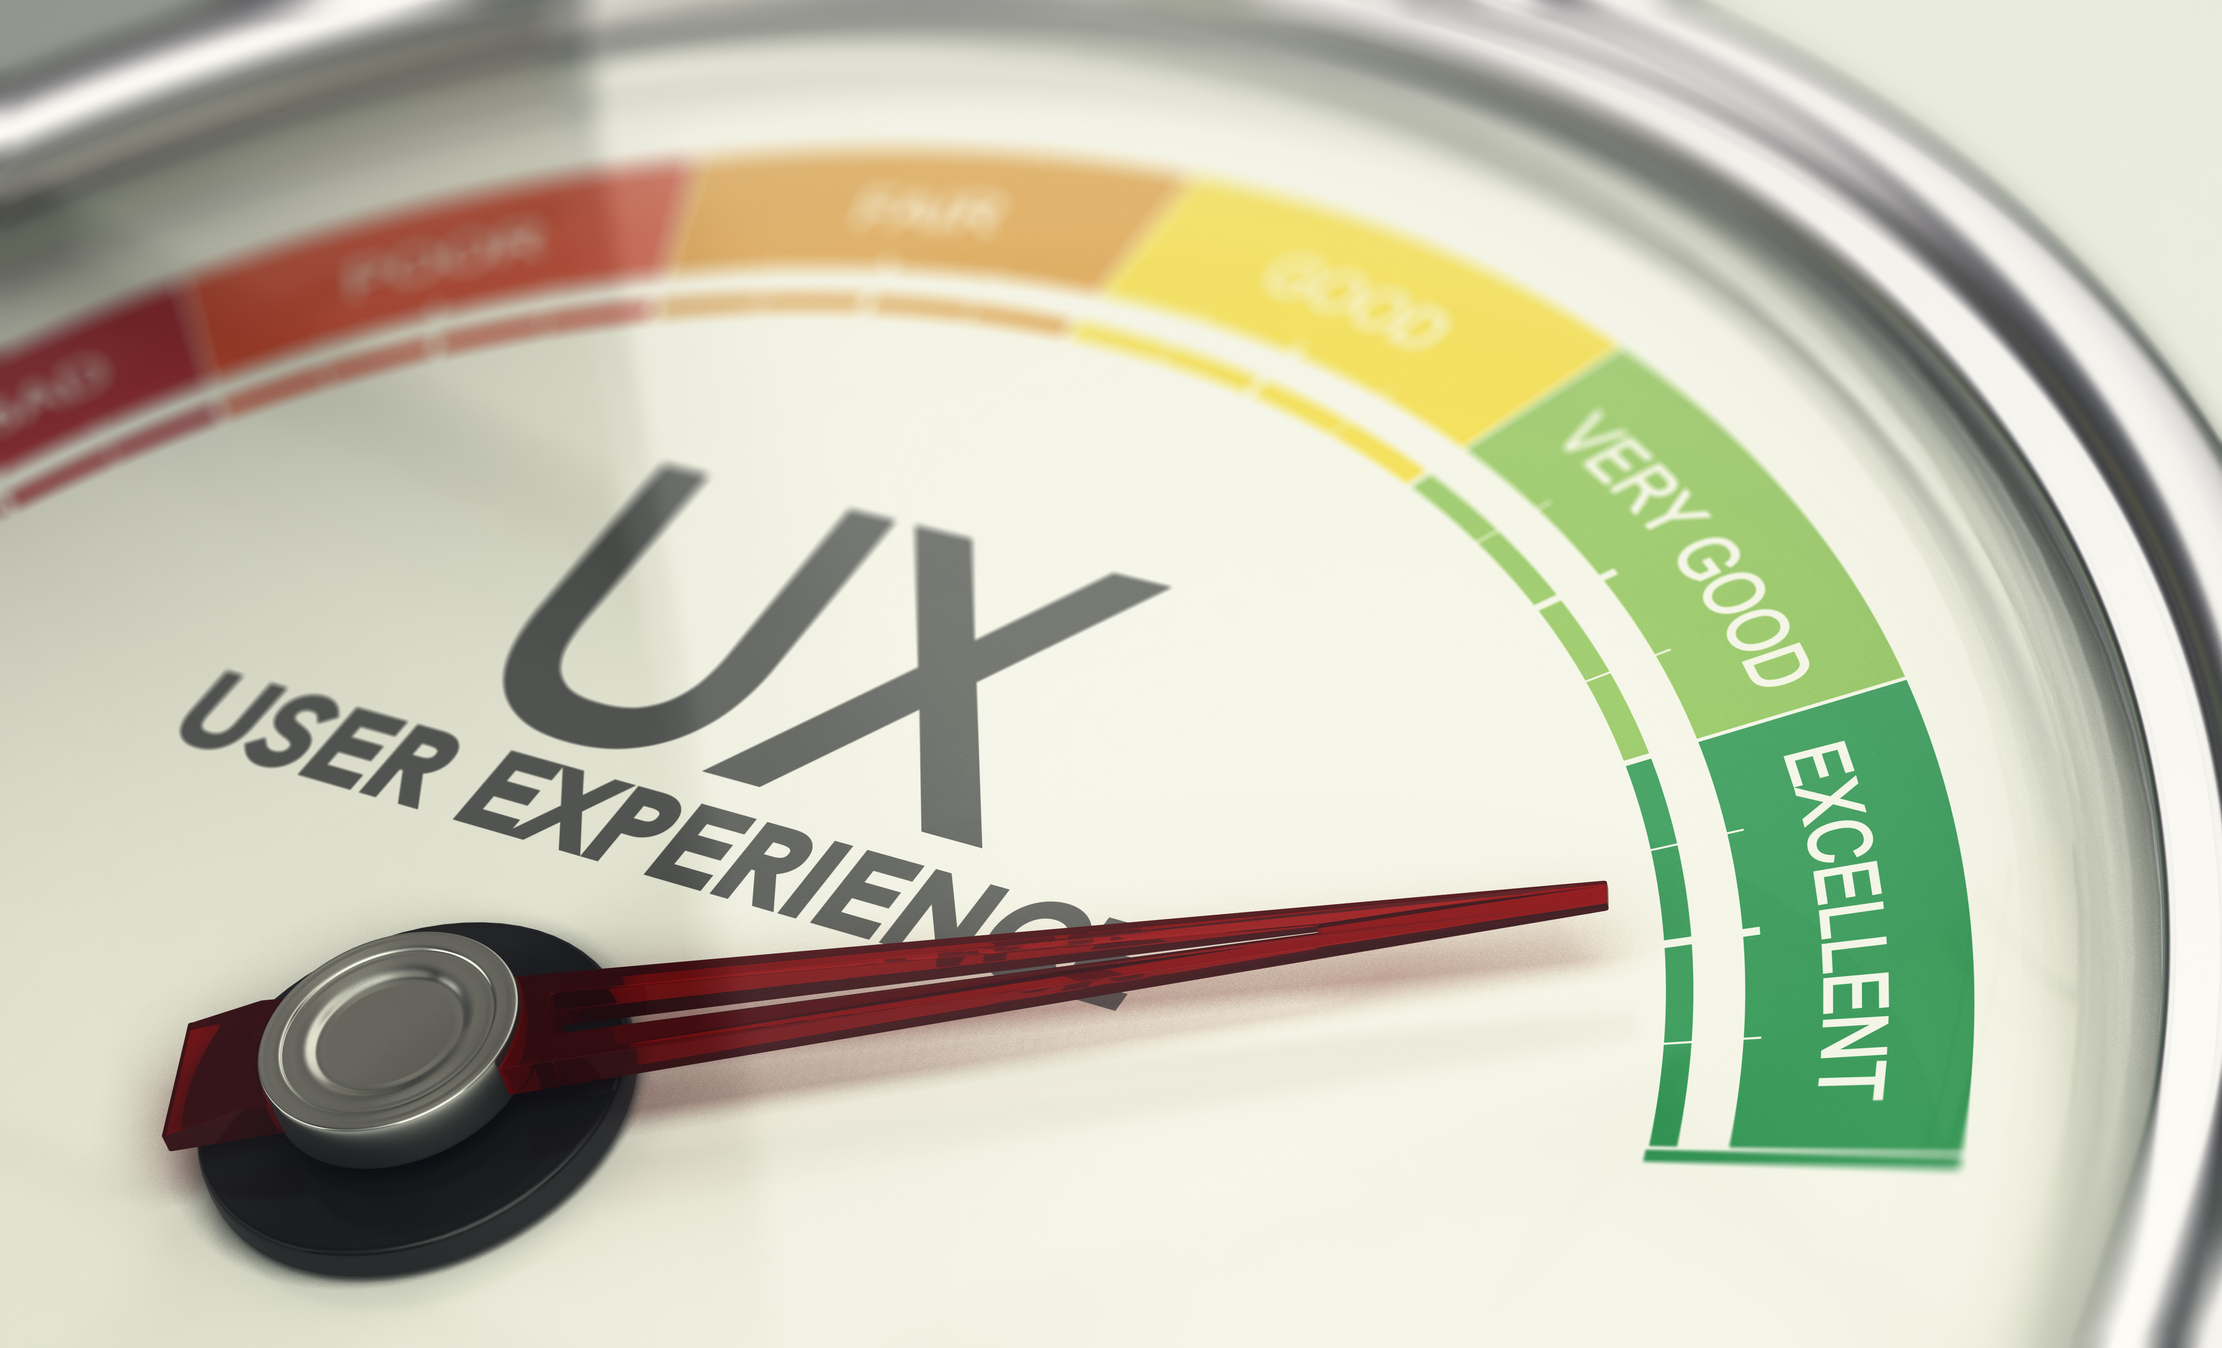 excellent user design experience gauge